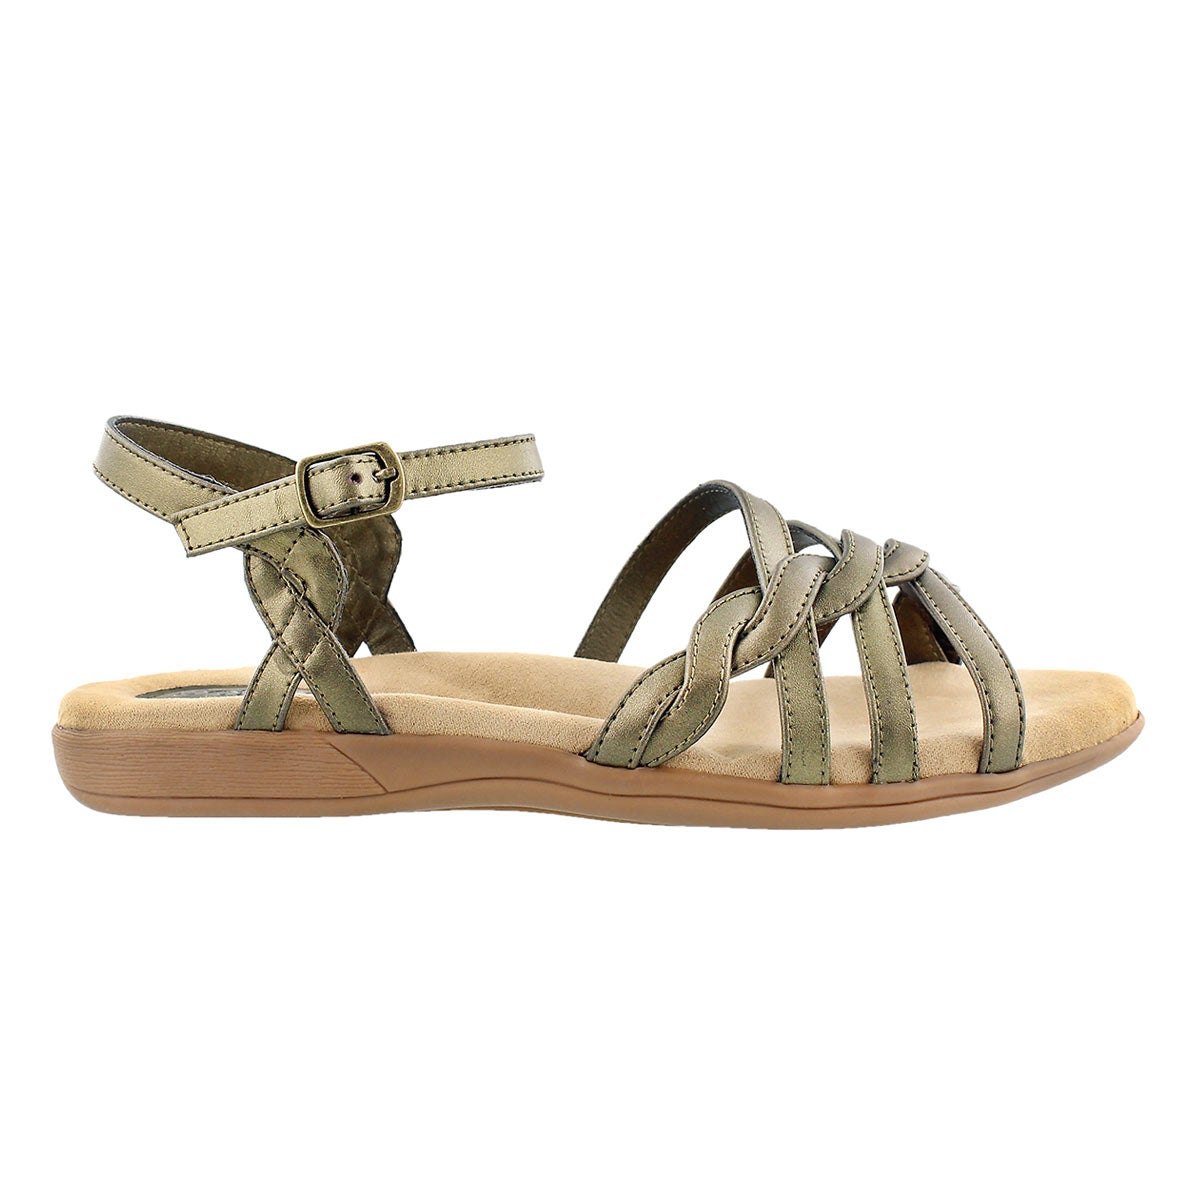 Sandale avec mousse visc. GRACE, or, fem